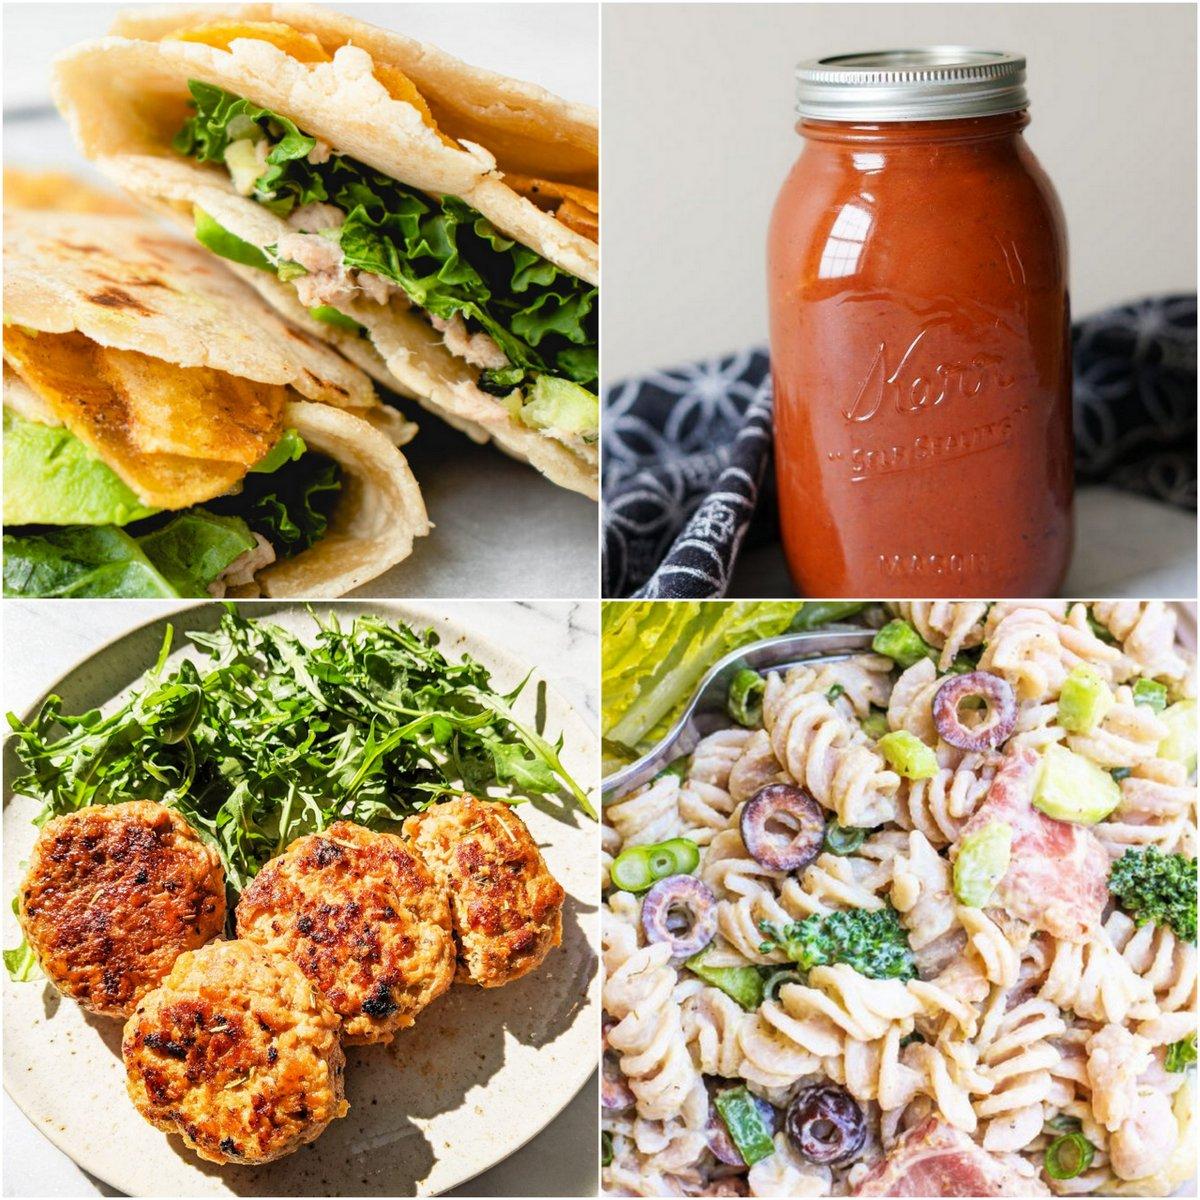 Paleo AIP Recipe Roundtable #363   Phoenix Helix - *Featured Recipes: Crunchy Tuna Wraps, Easy Tomatoless Pasta Sauce (No Beets), Sweet Potato Turkey Patties, and Antipasto Pasta Salad.